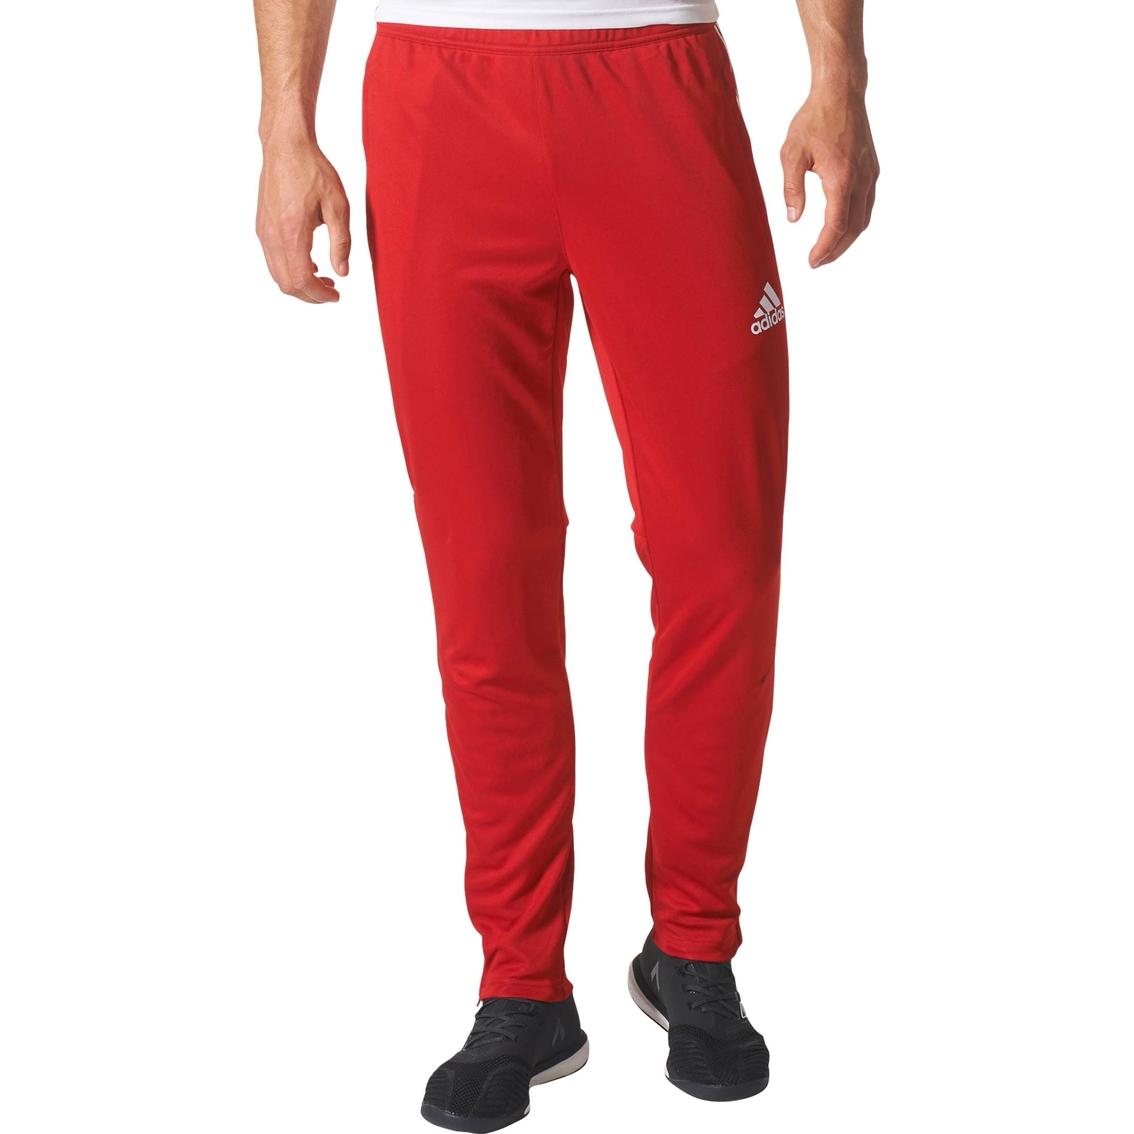 Adidas Tiro 3 Stripe Training Pants | Pants | Apparel | Shop